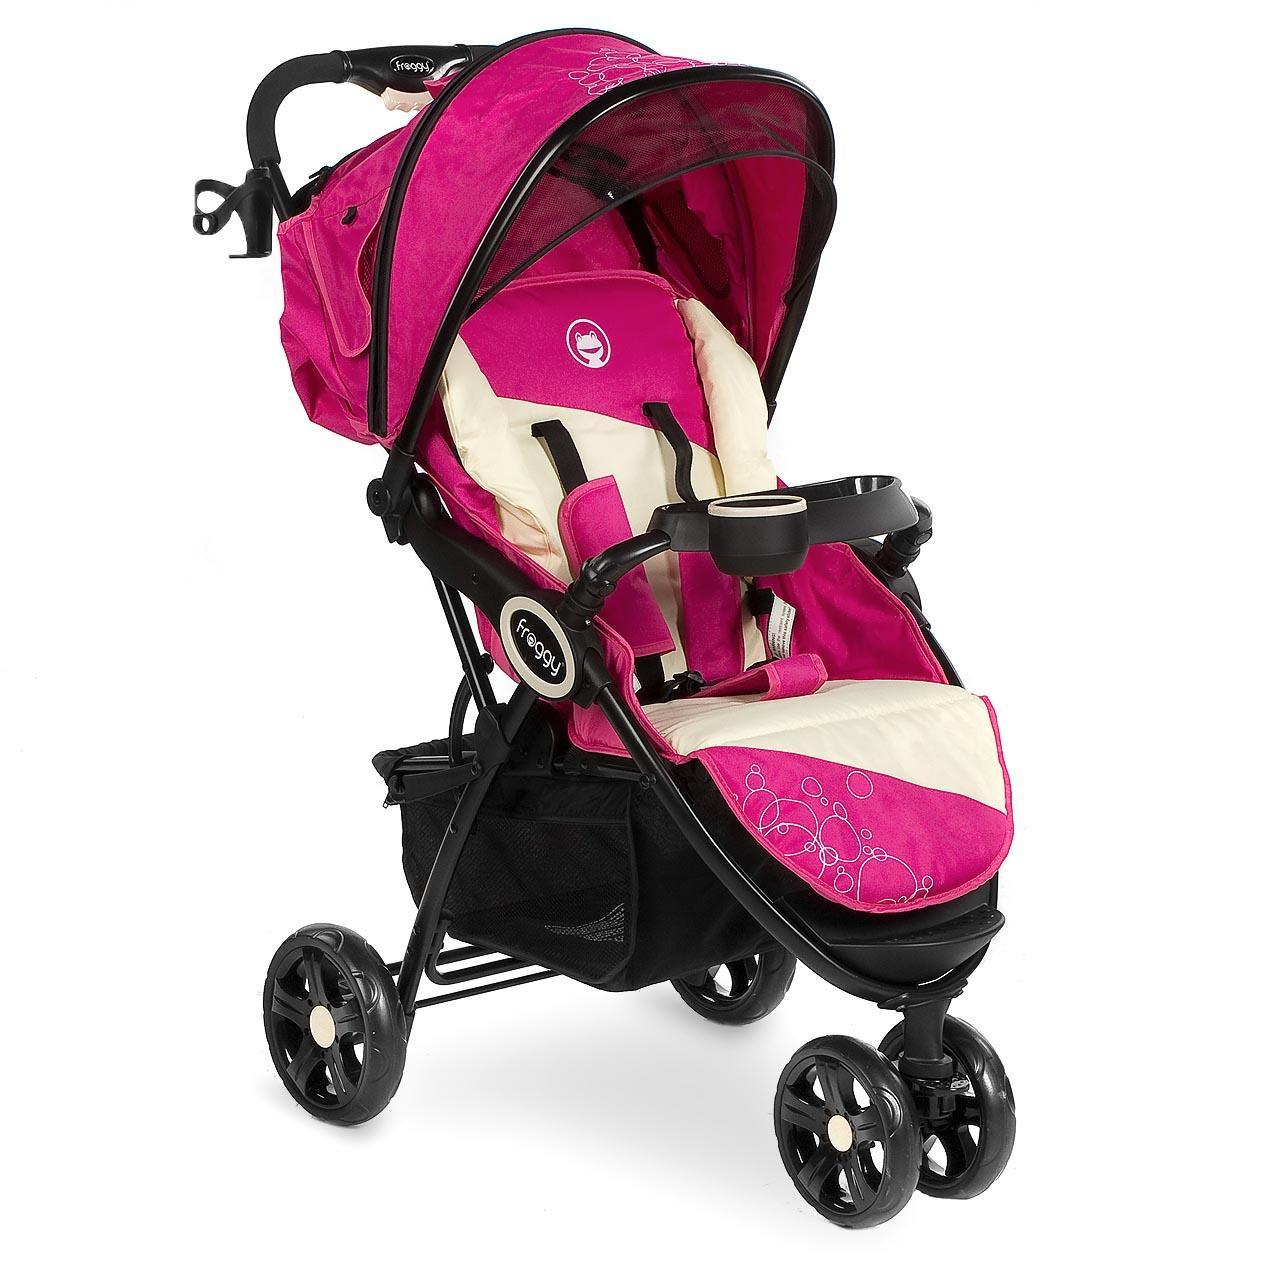 dingo pram buggy pushchair baby children 3 wheelers one touch funktion ebay. Black Bedroom Furniture Sets. Home Design Ideas